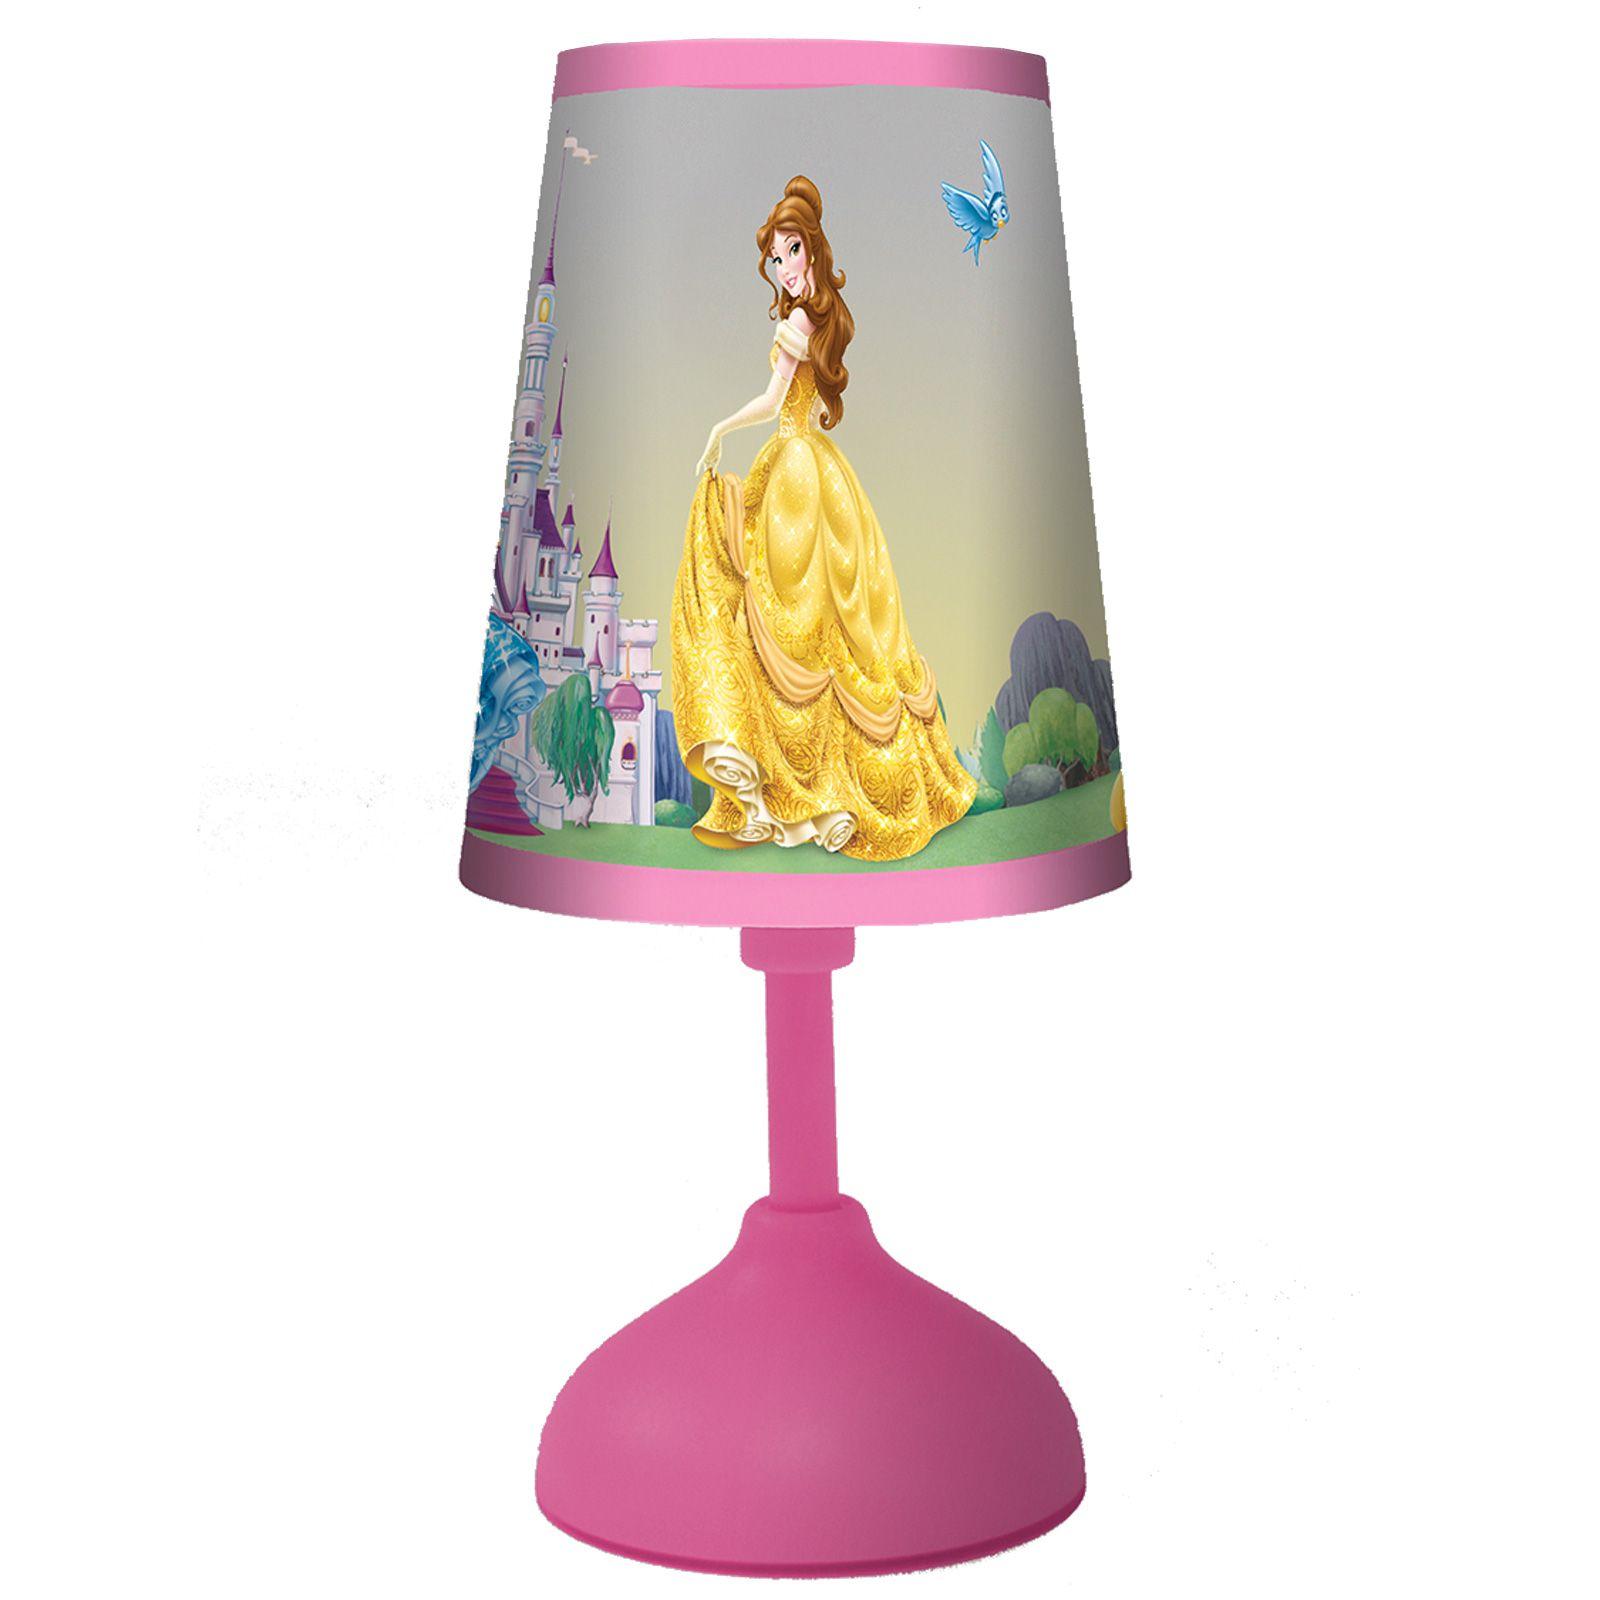 DISNEY PRINCESS MINI TABLE LAMP LIGHT NEW 100% OFFICIAL